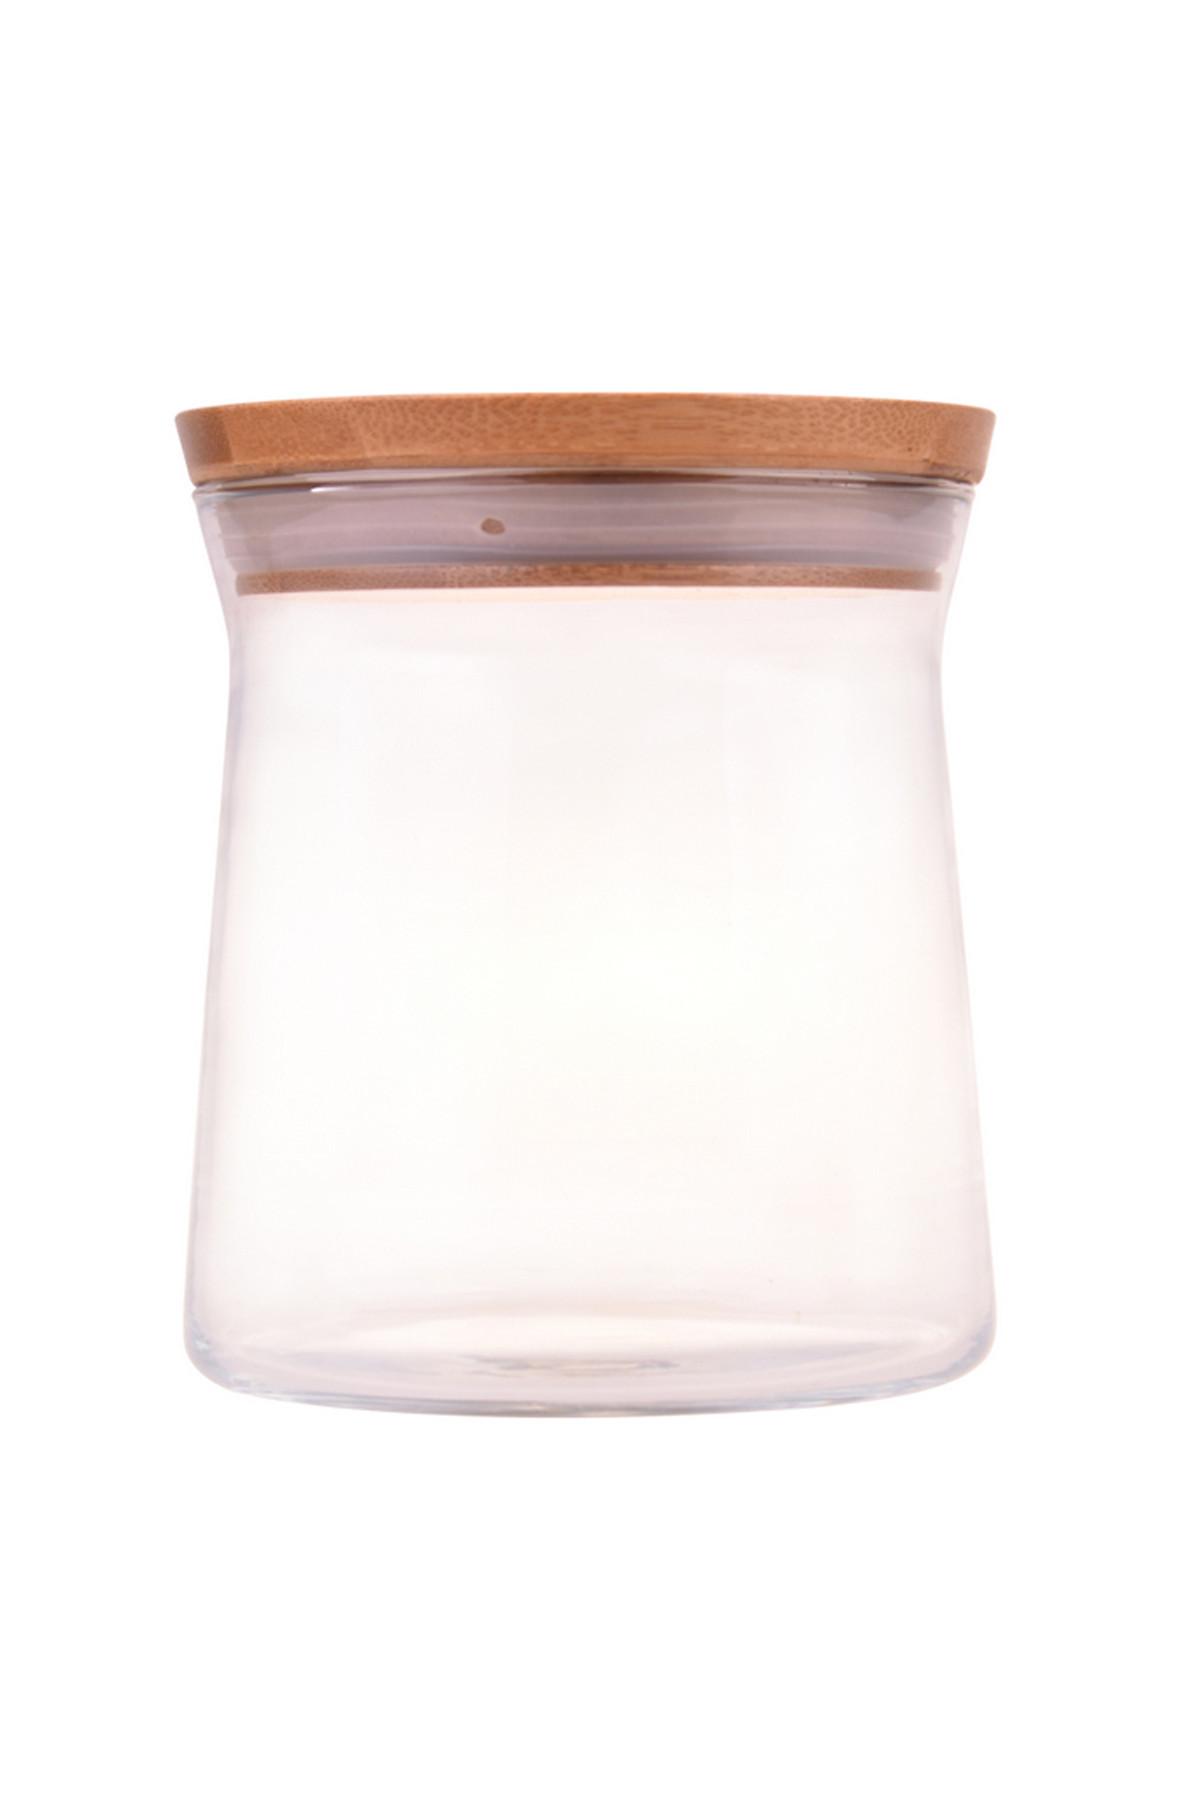 Sepetcibaba - Olla - Cam Saklama Kabı 800 ml